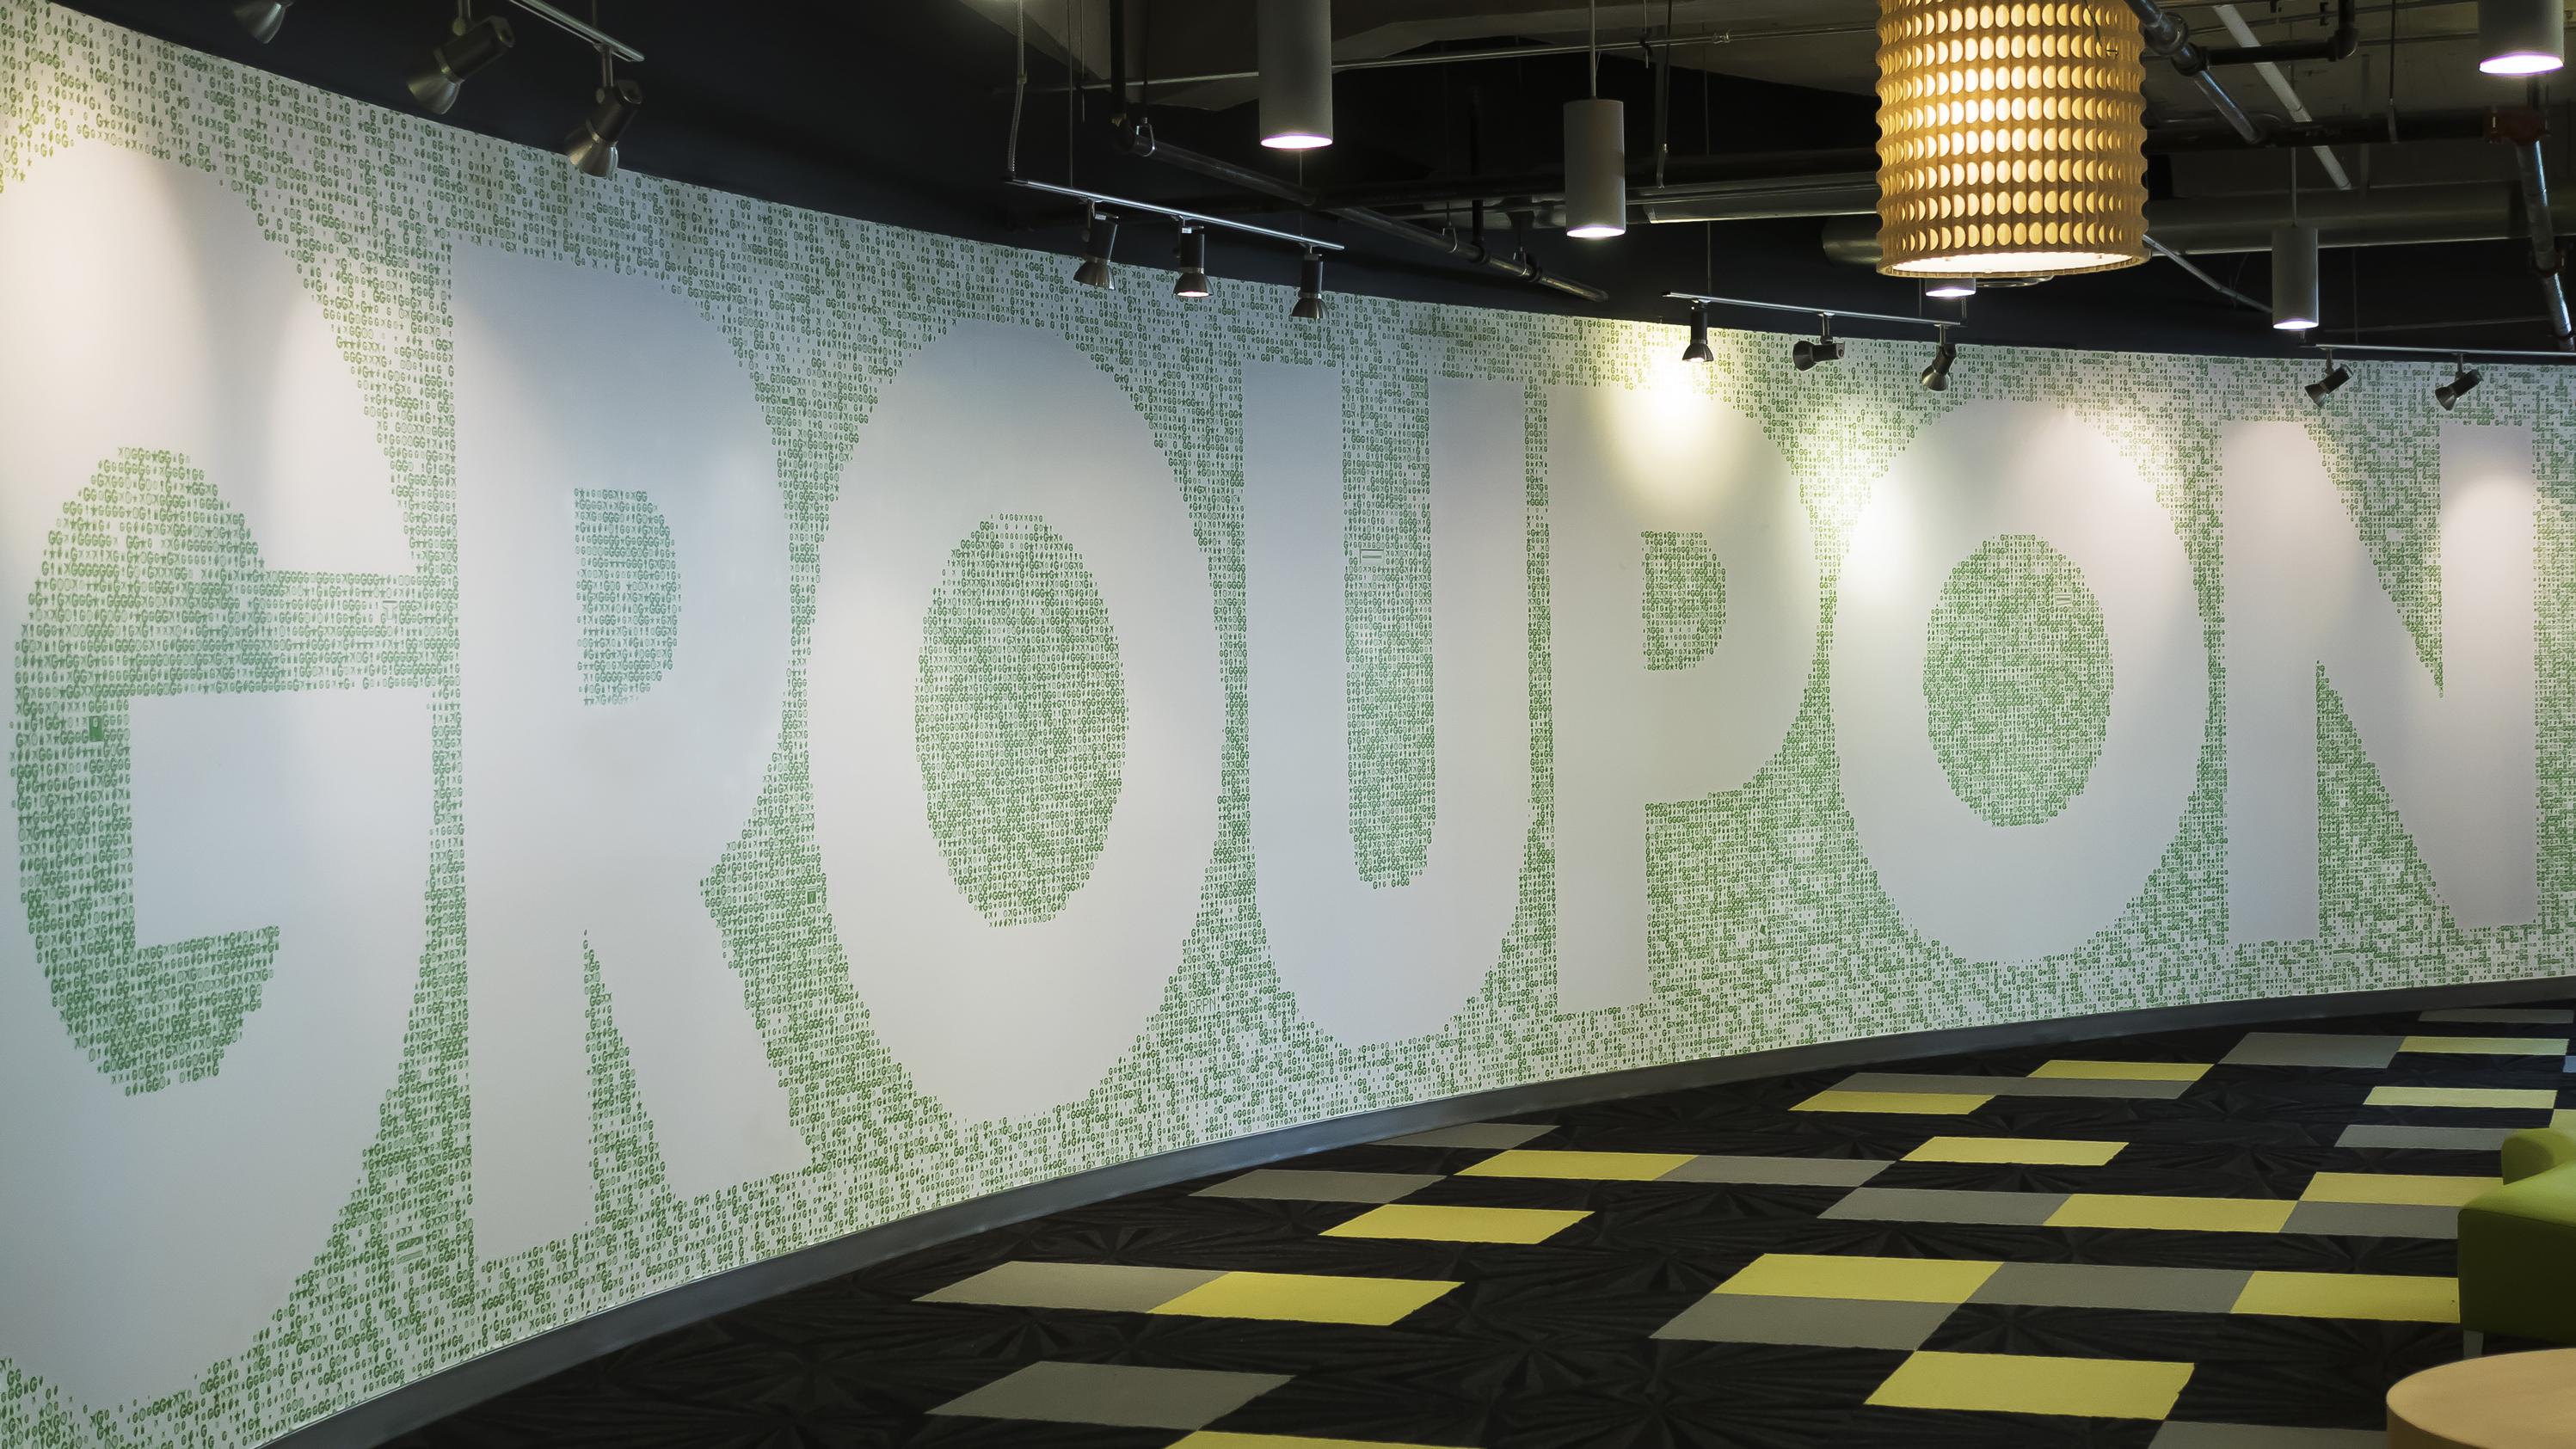 Groupon wall at the company's main office.